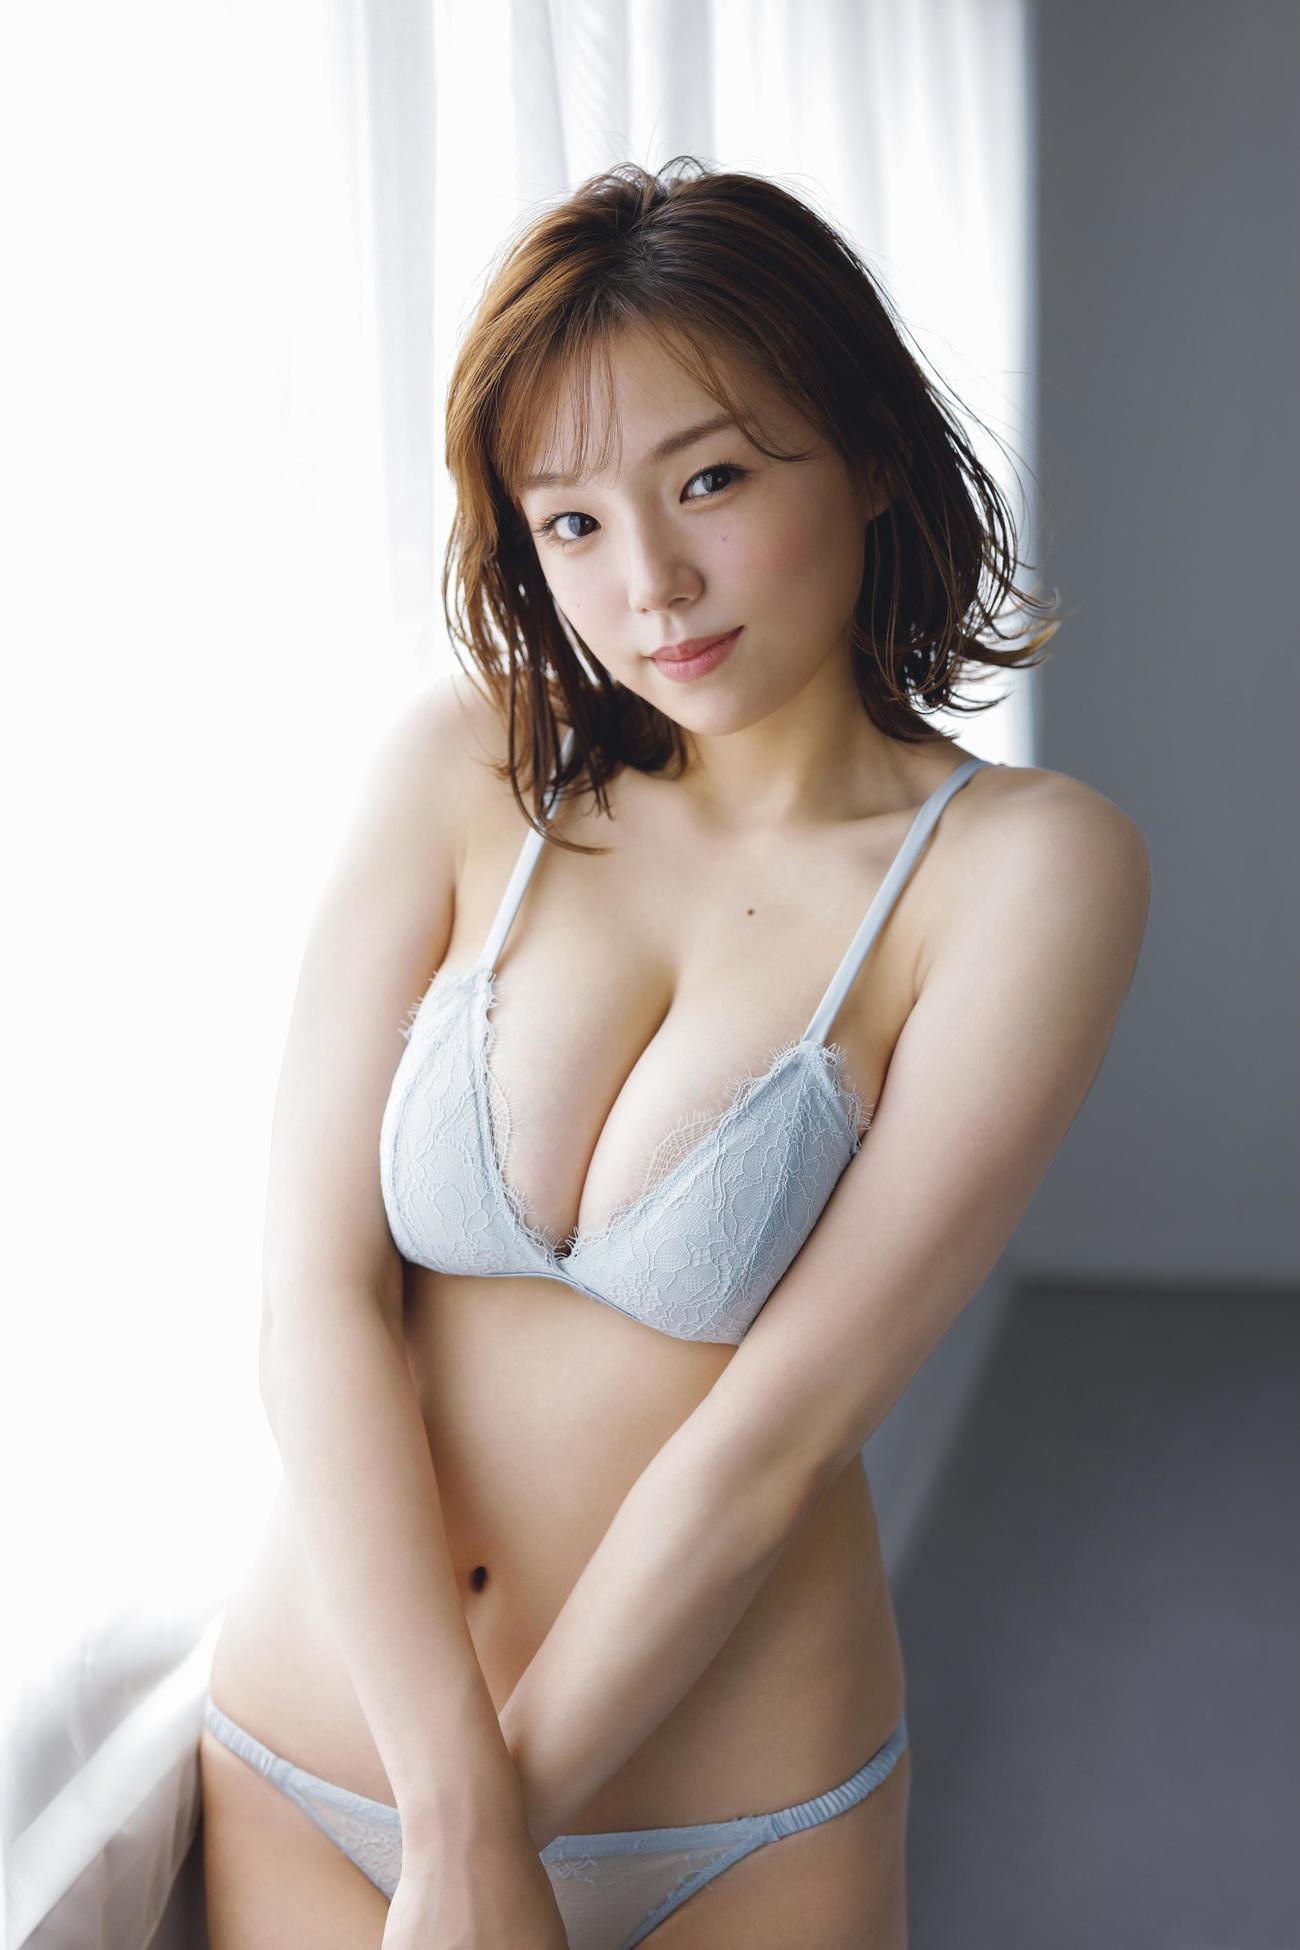 「FRIDAY」で約4年ぶりとなるグラビアを披露する篠崎愛